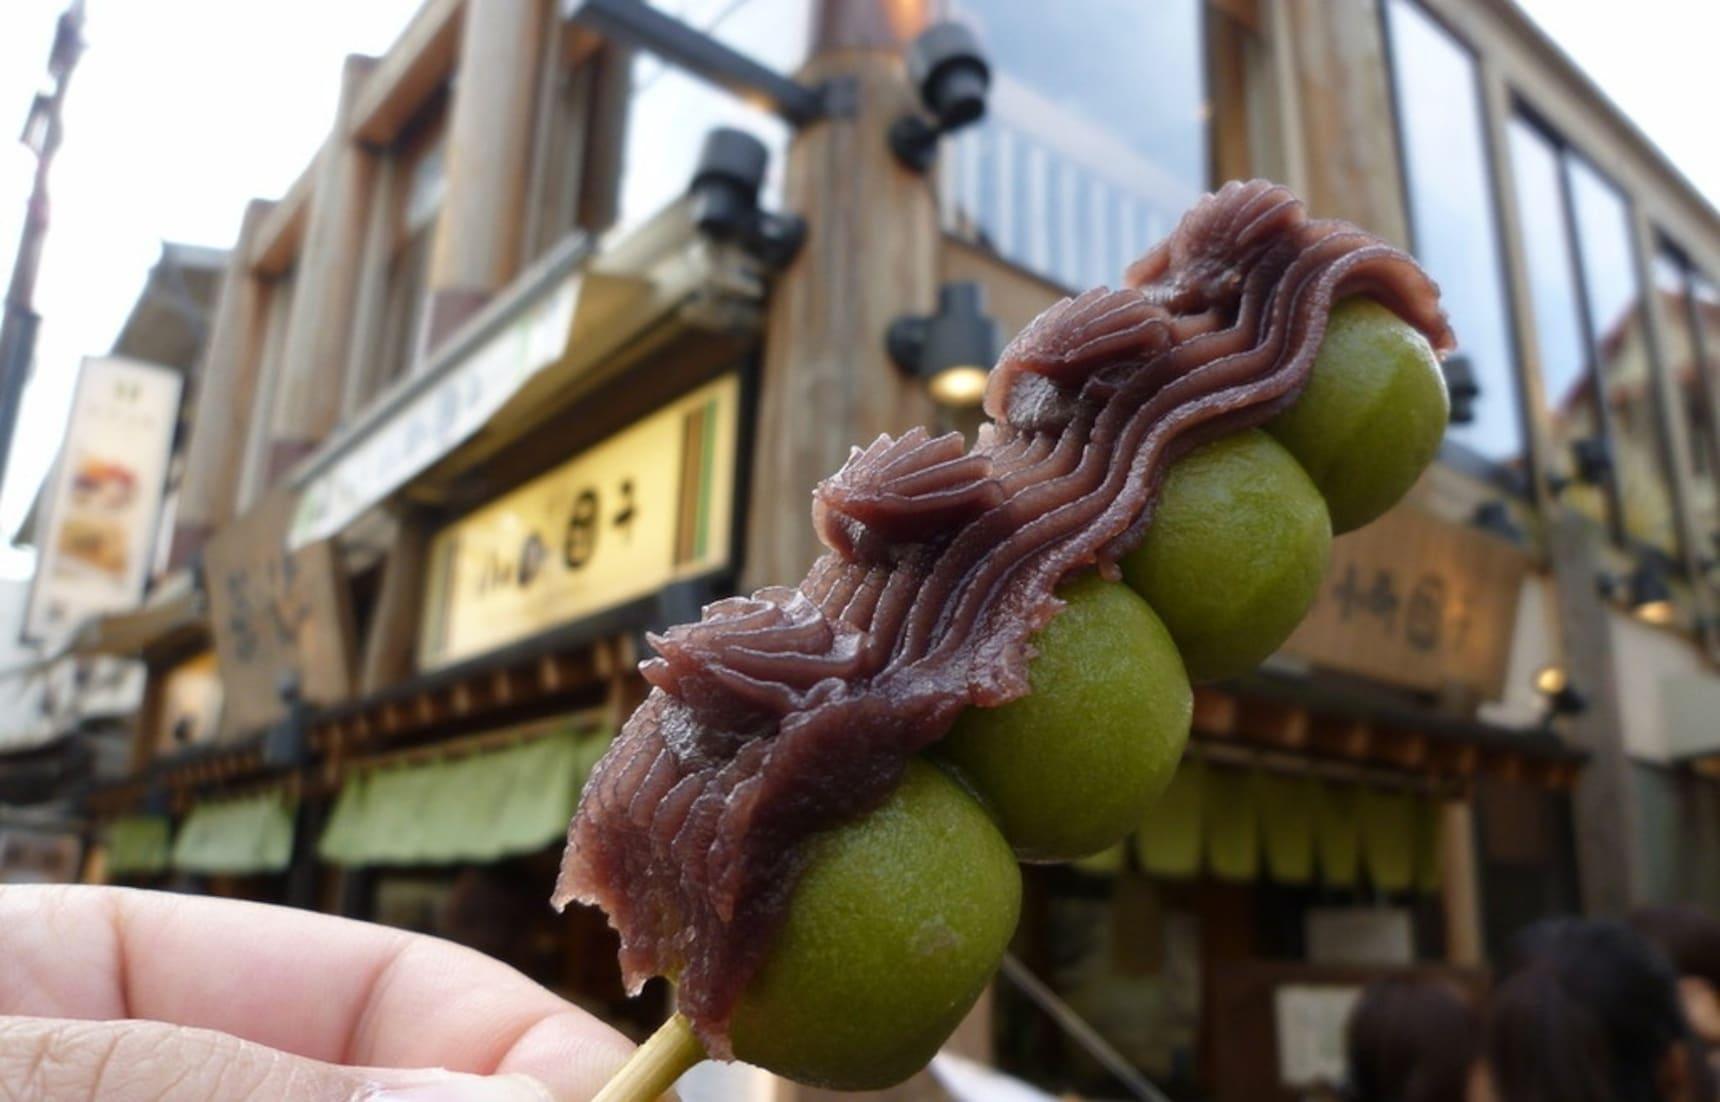 Kamakura's Komachi Street Top 10 Food Guide